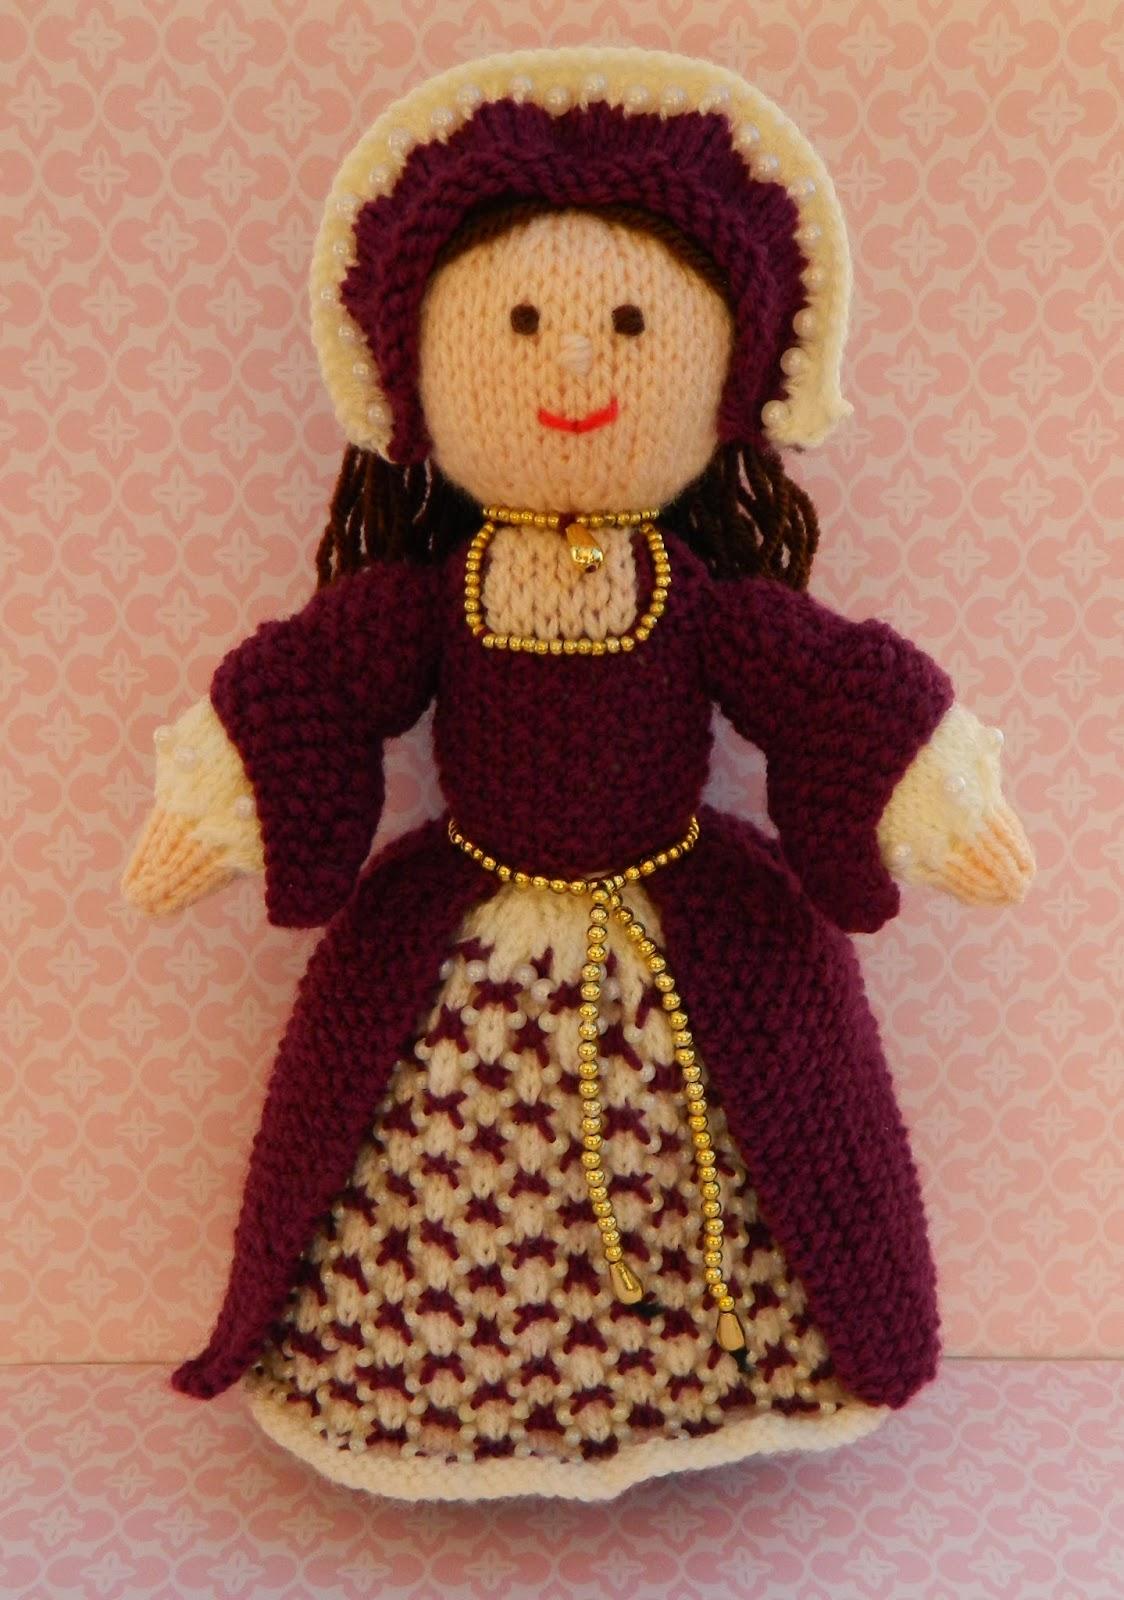 Knitting Patterns Toys Uk : Edith grace designs original doll toy knitting